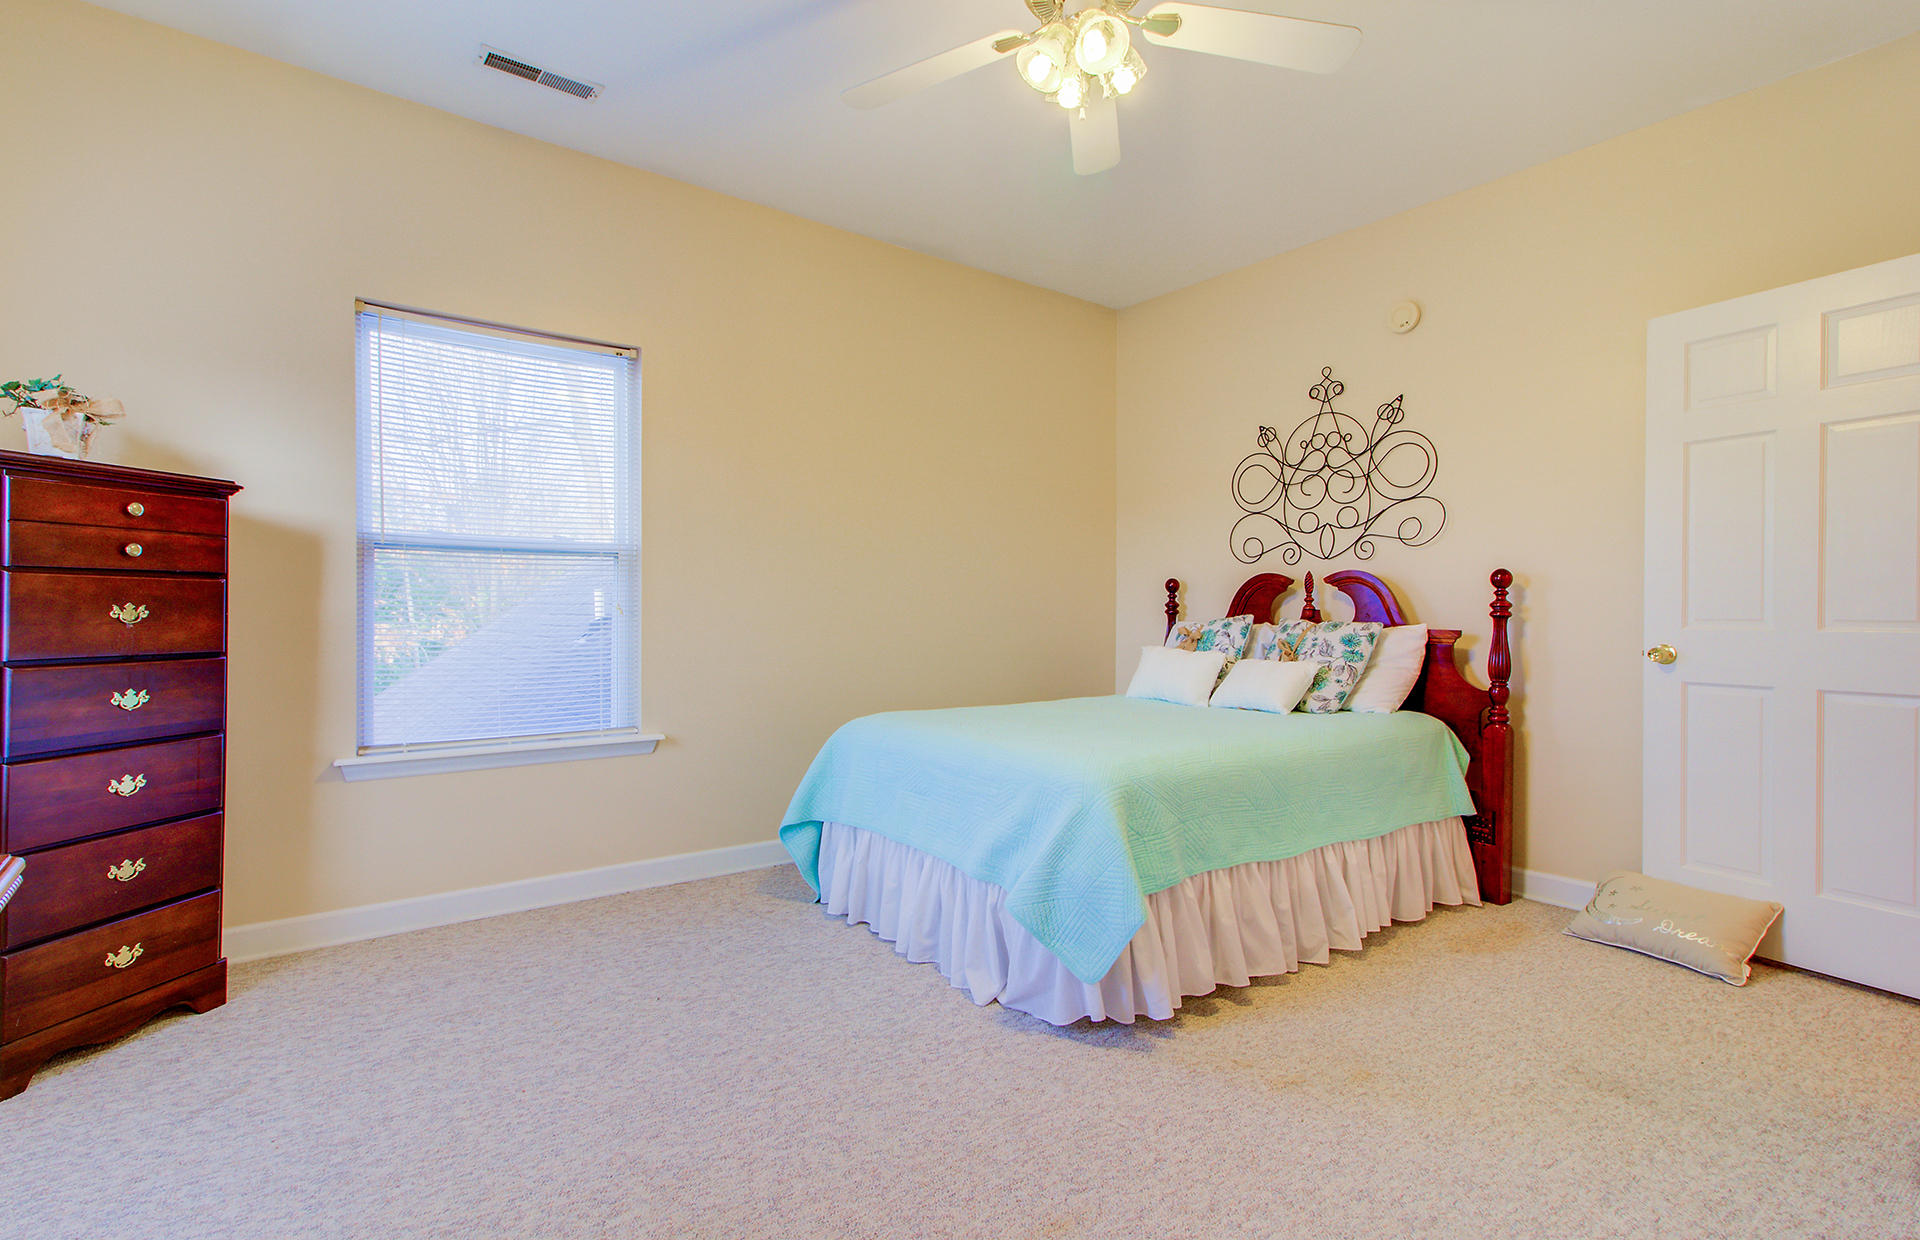 Bakers Landing Homes For Sale - 105 River Oak, North Charleston, SC - 1